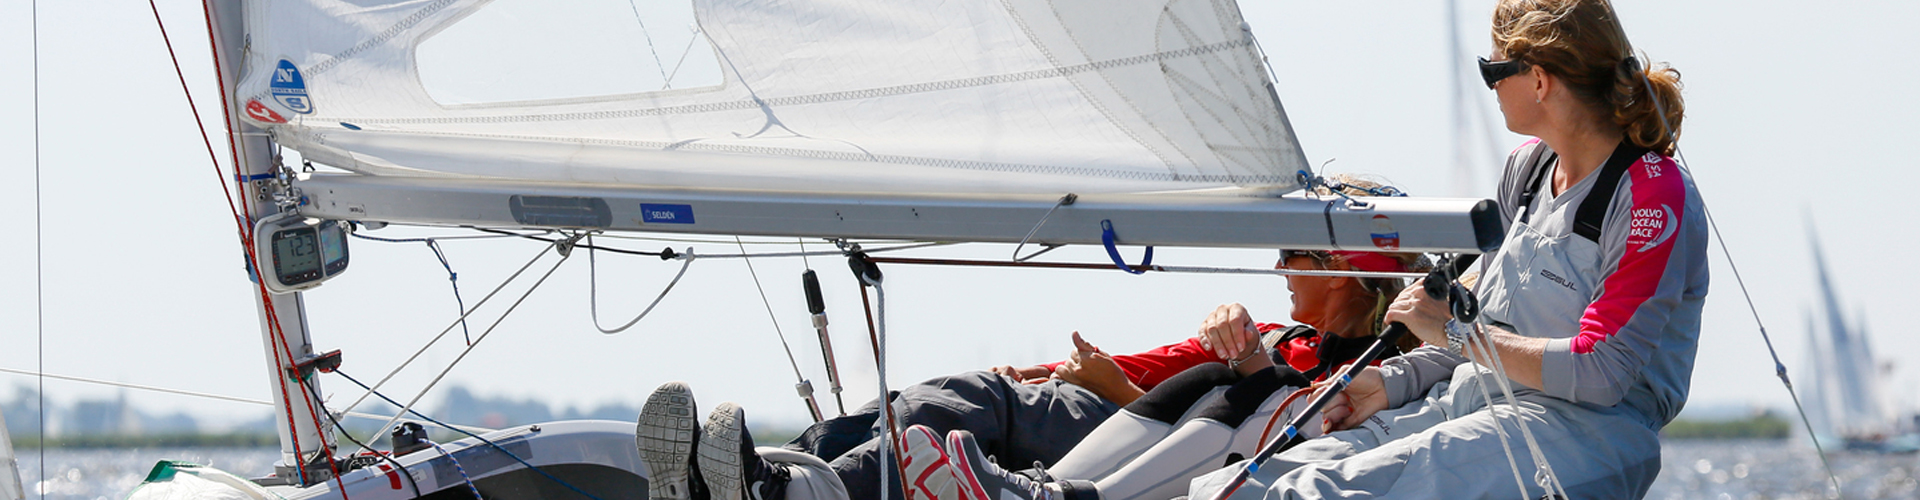 Ruyten One Design Keelboats Melges Yngling SB20